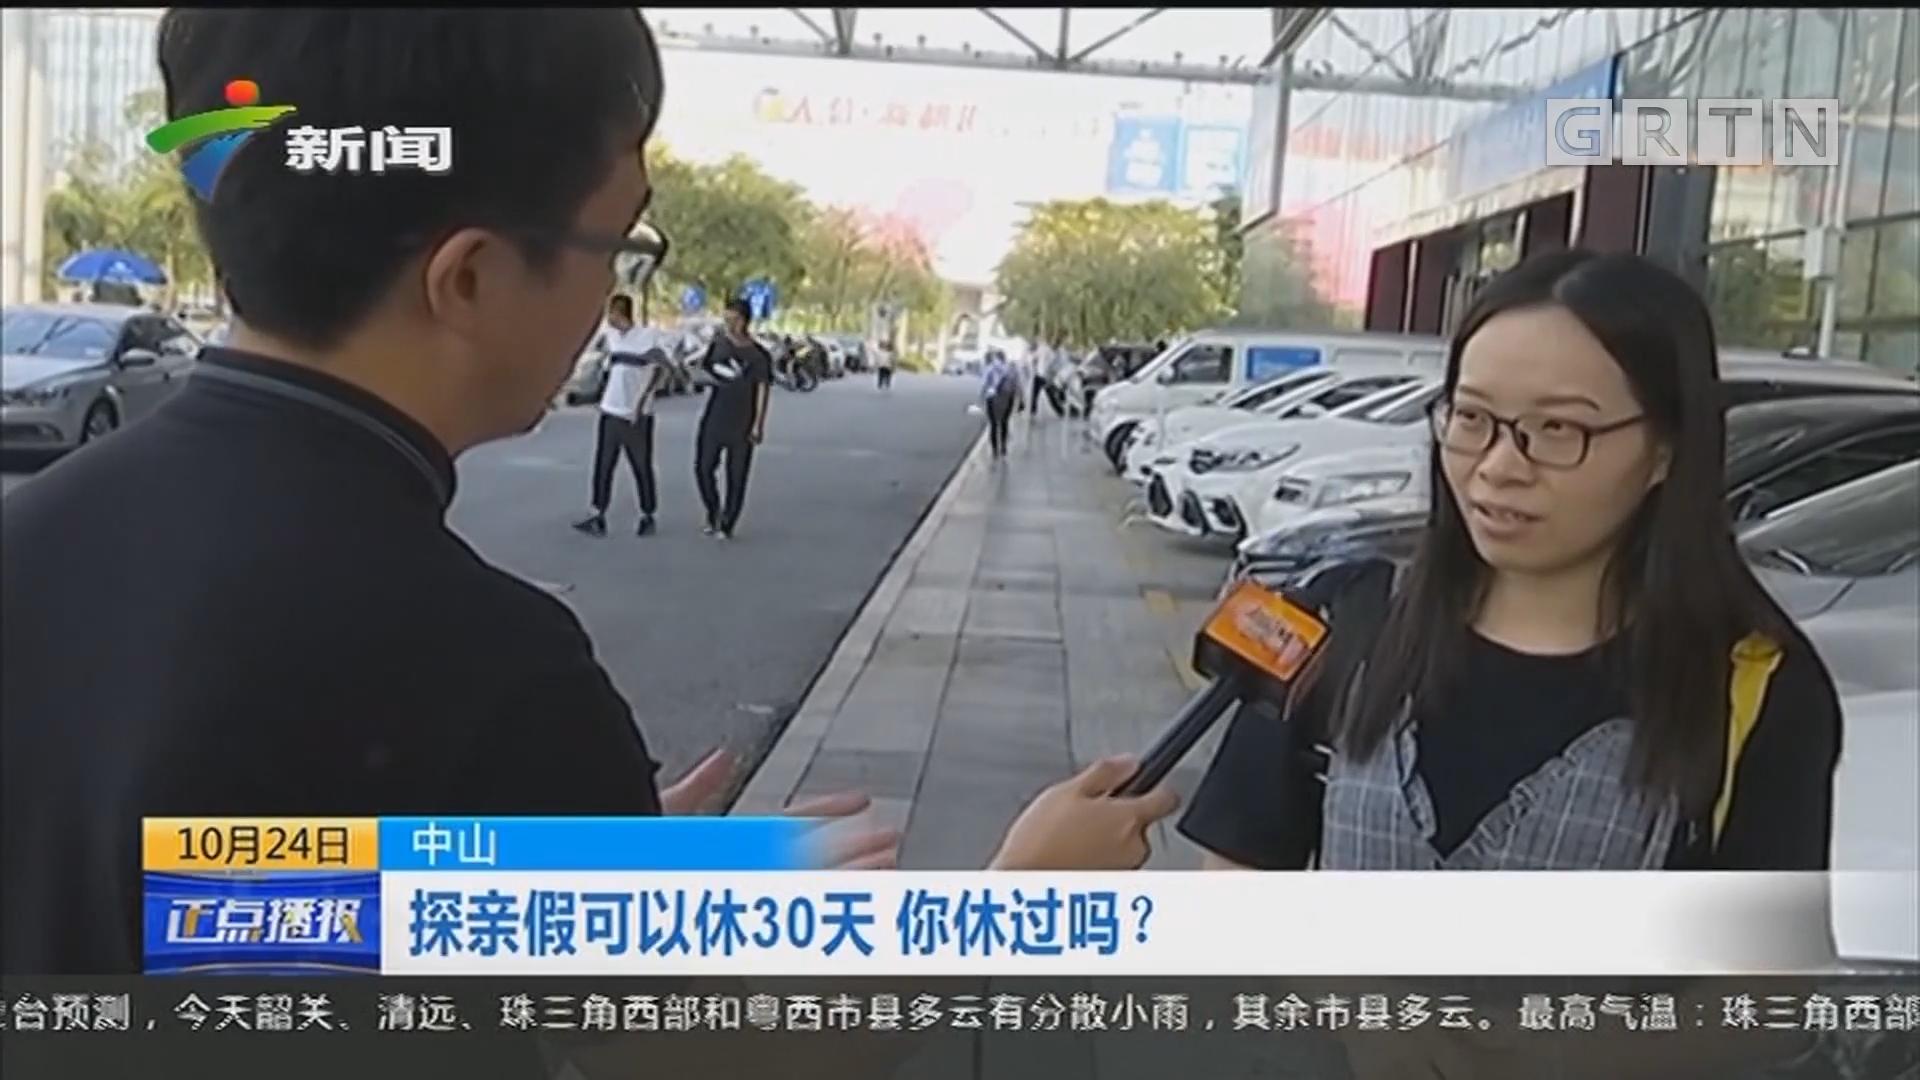 [HD][2019-10-24]正点播报:中山:探亲假可以休30天 你休过吗?